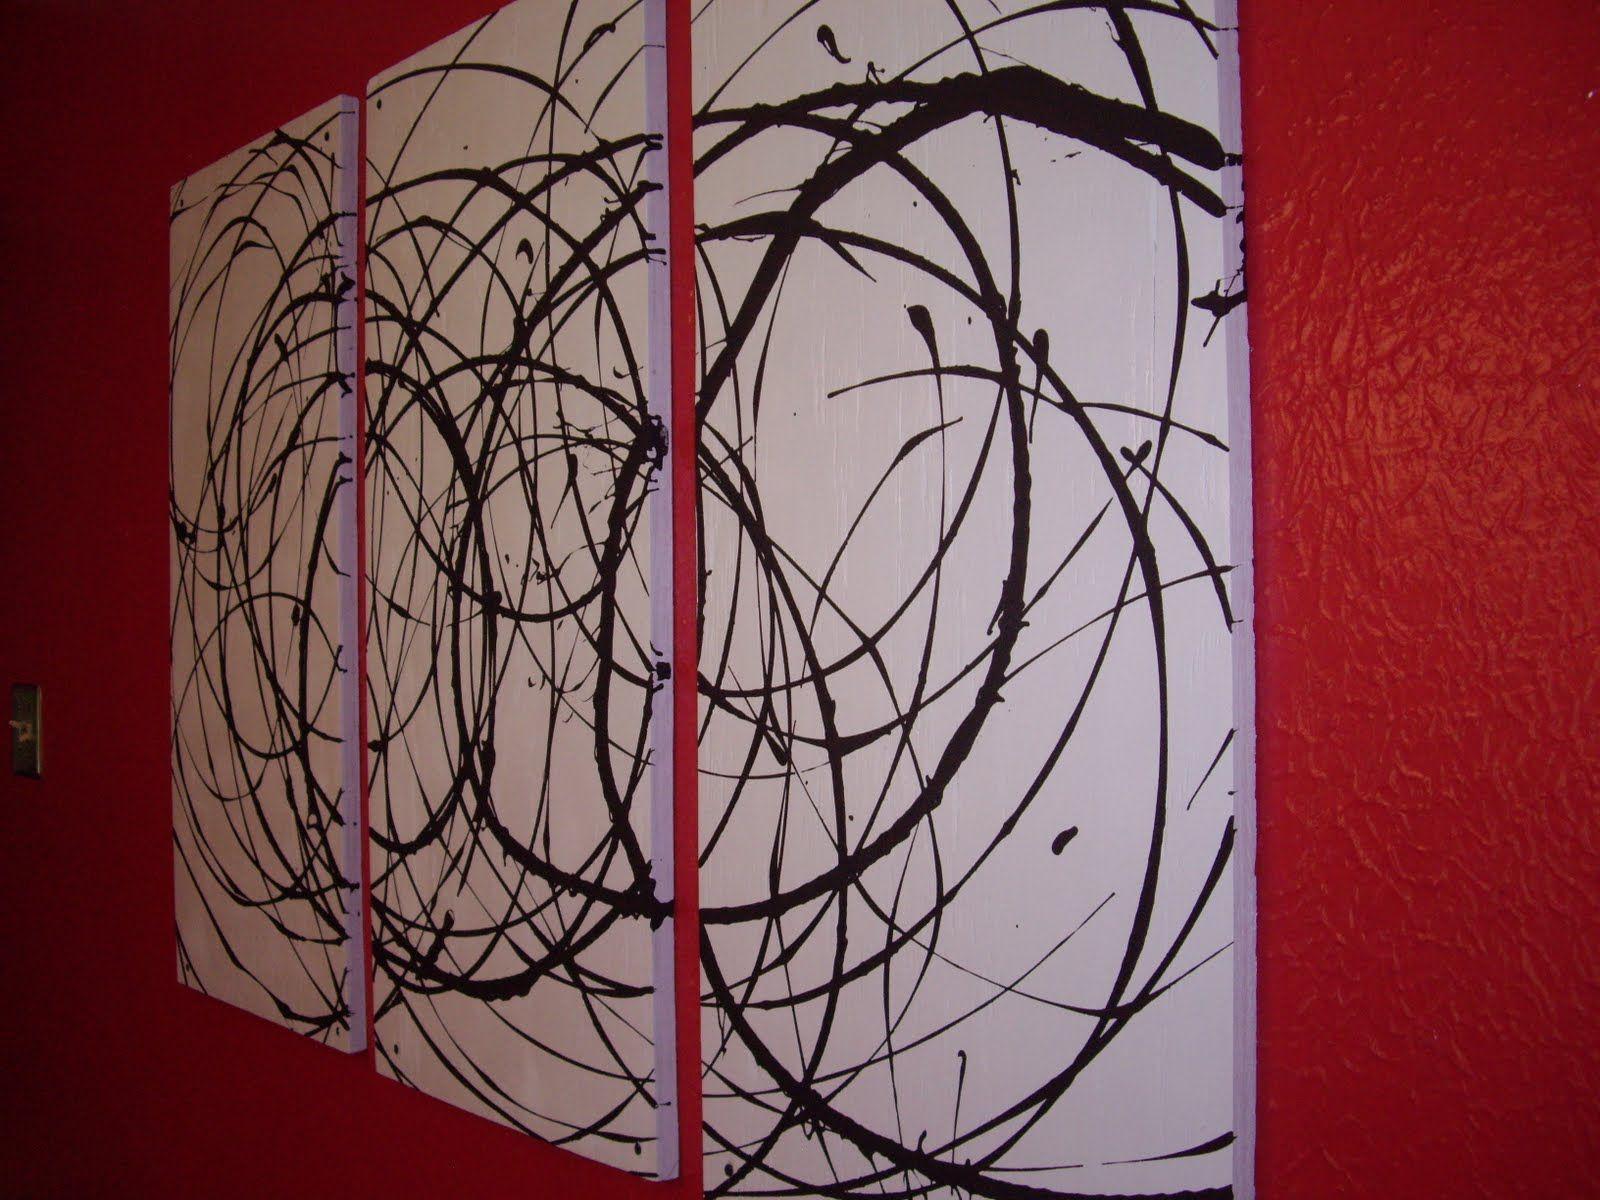 Diywallart wallpaper diy wall art 1600x1200 young and crafty diy diywallart wallpaper diy wall art 1600x1200 young and crafty diy wall solutioingenieria Images